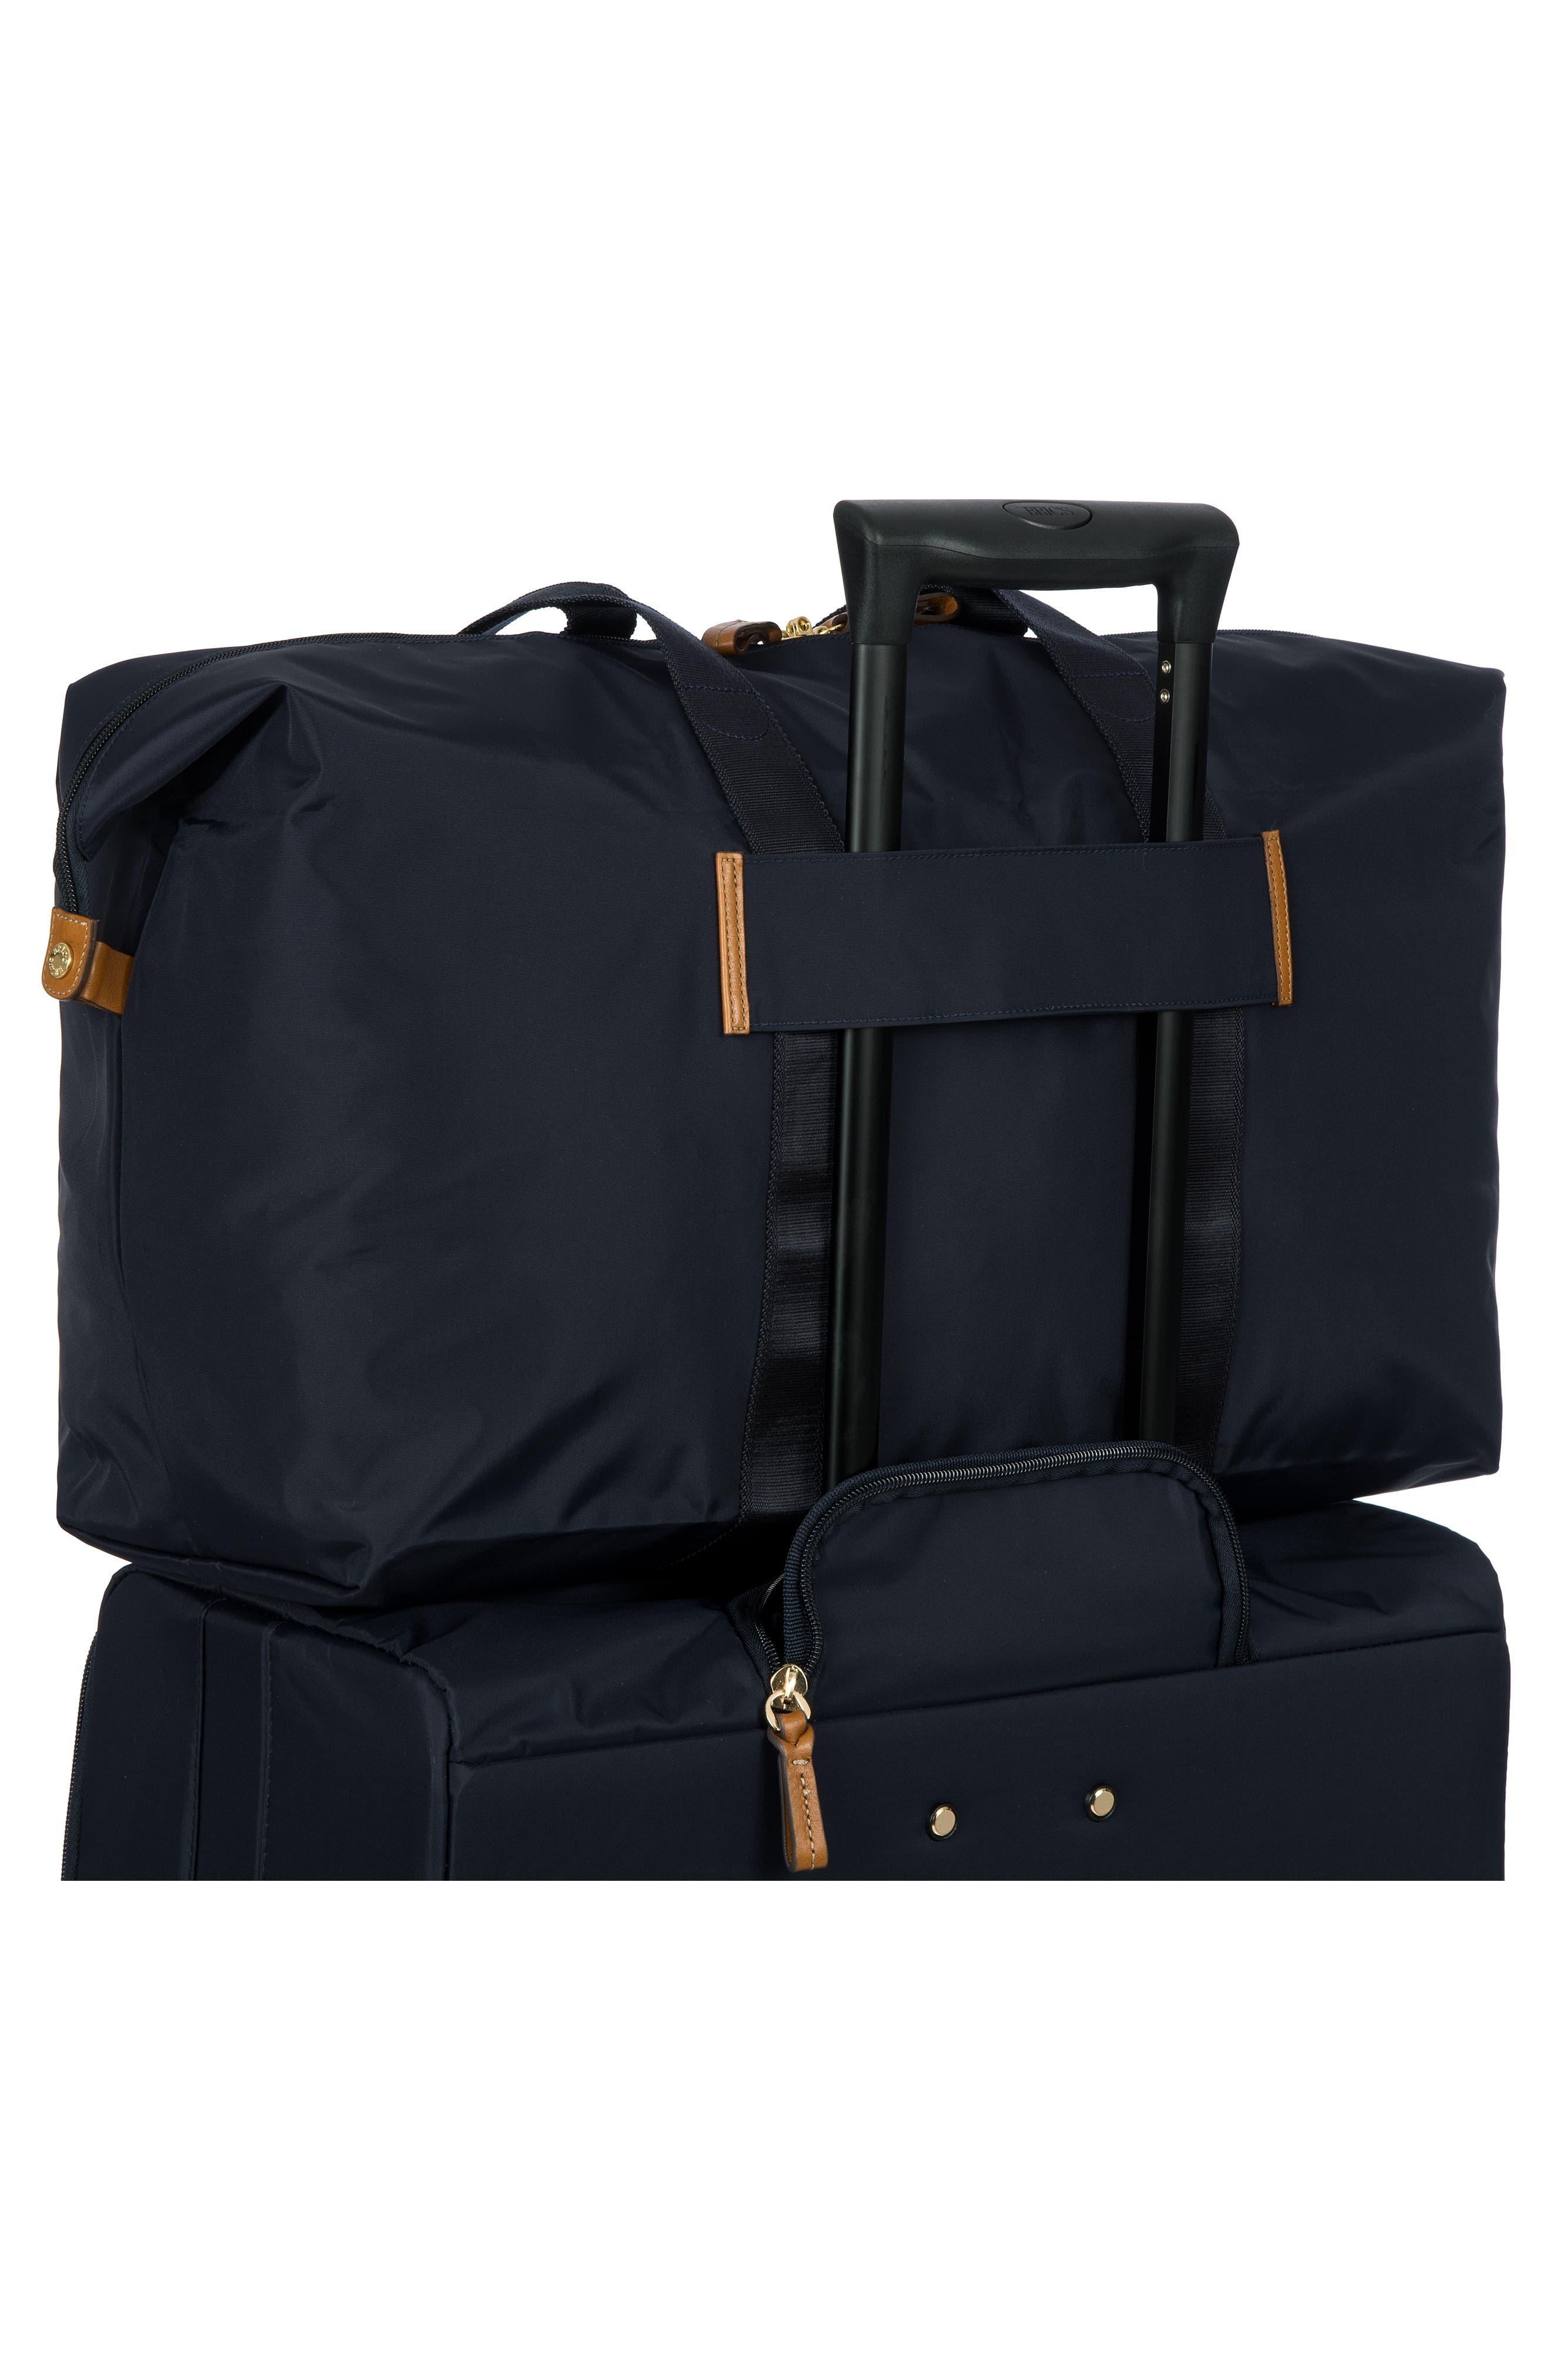 01aec9c4cf4bef Men's Bric's Bags & Backpacks   Nordstrom